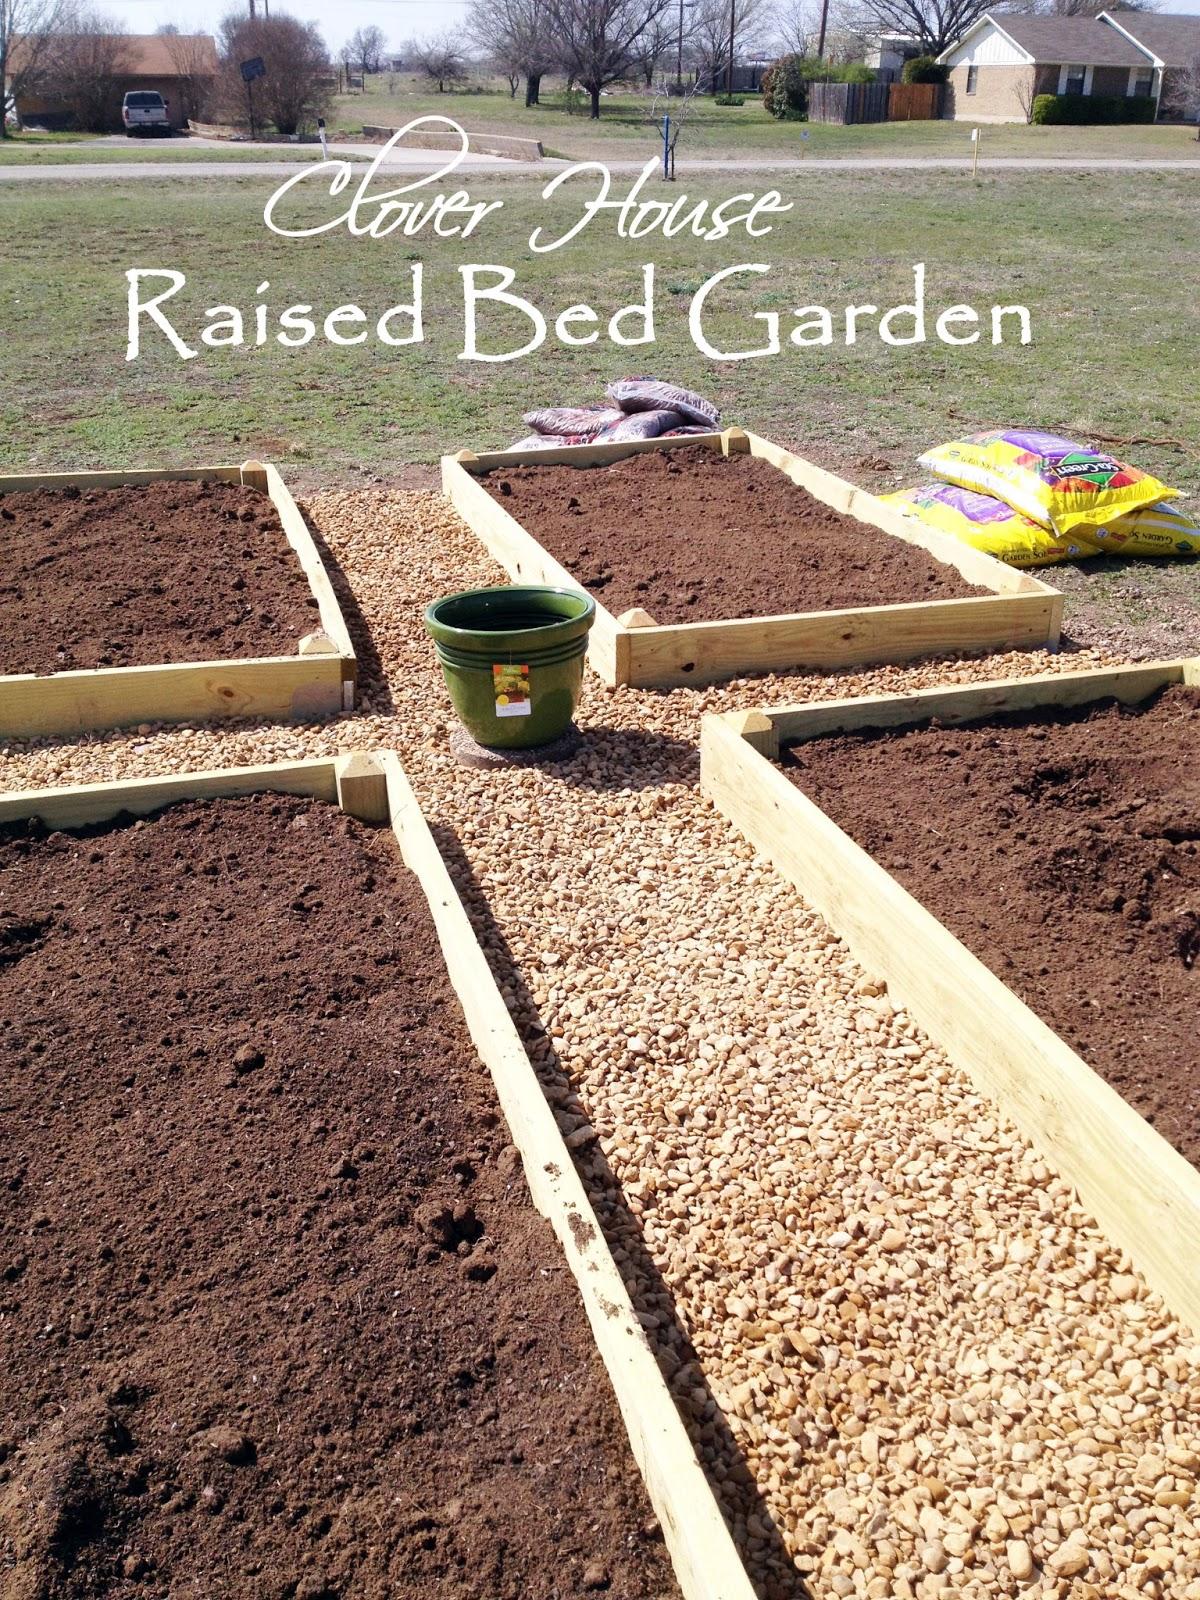 Gardens Raised: Clover House: Raised Bed Garden (Part 3